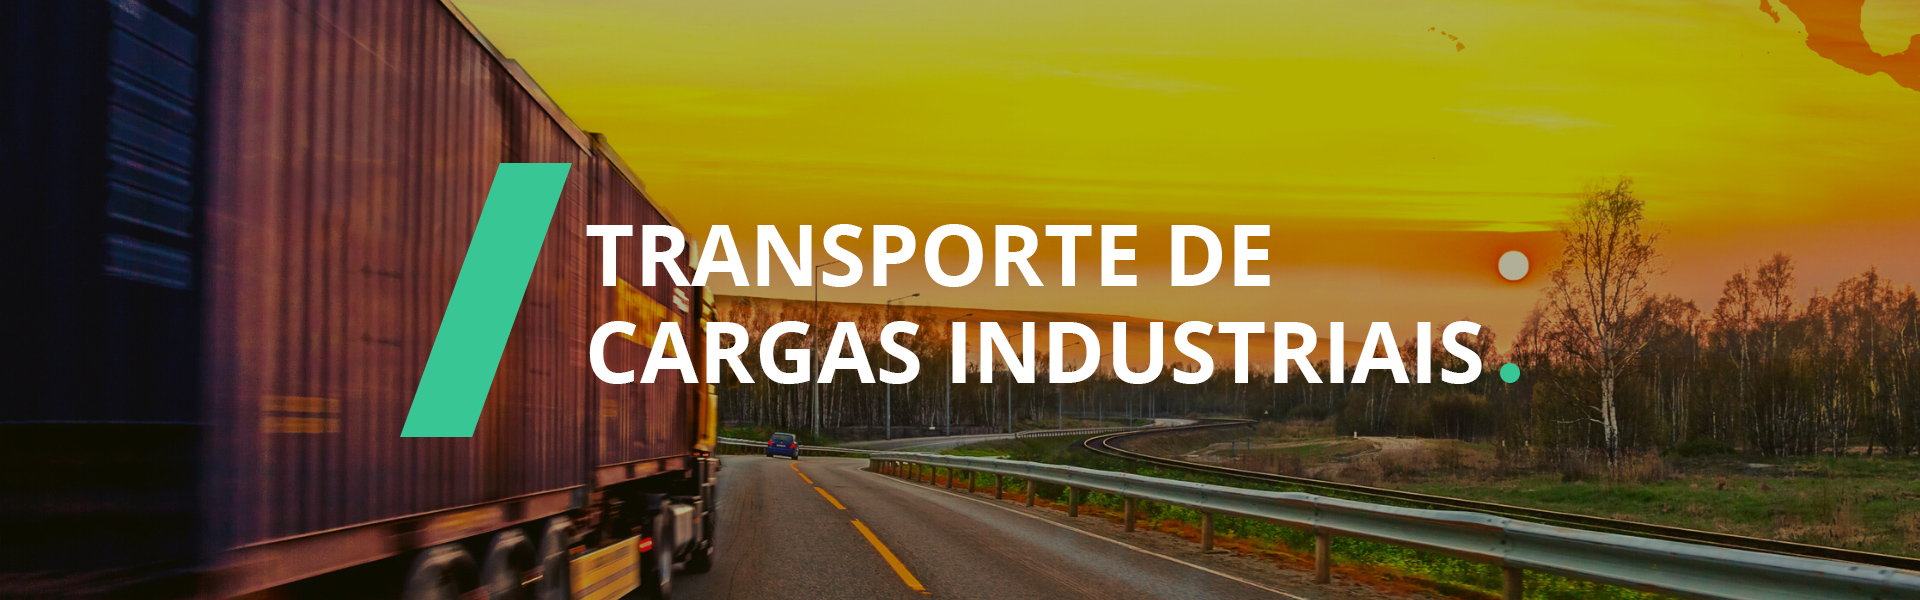 bg-carga-industrial